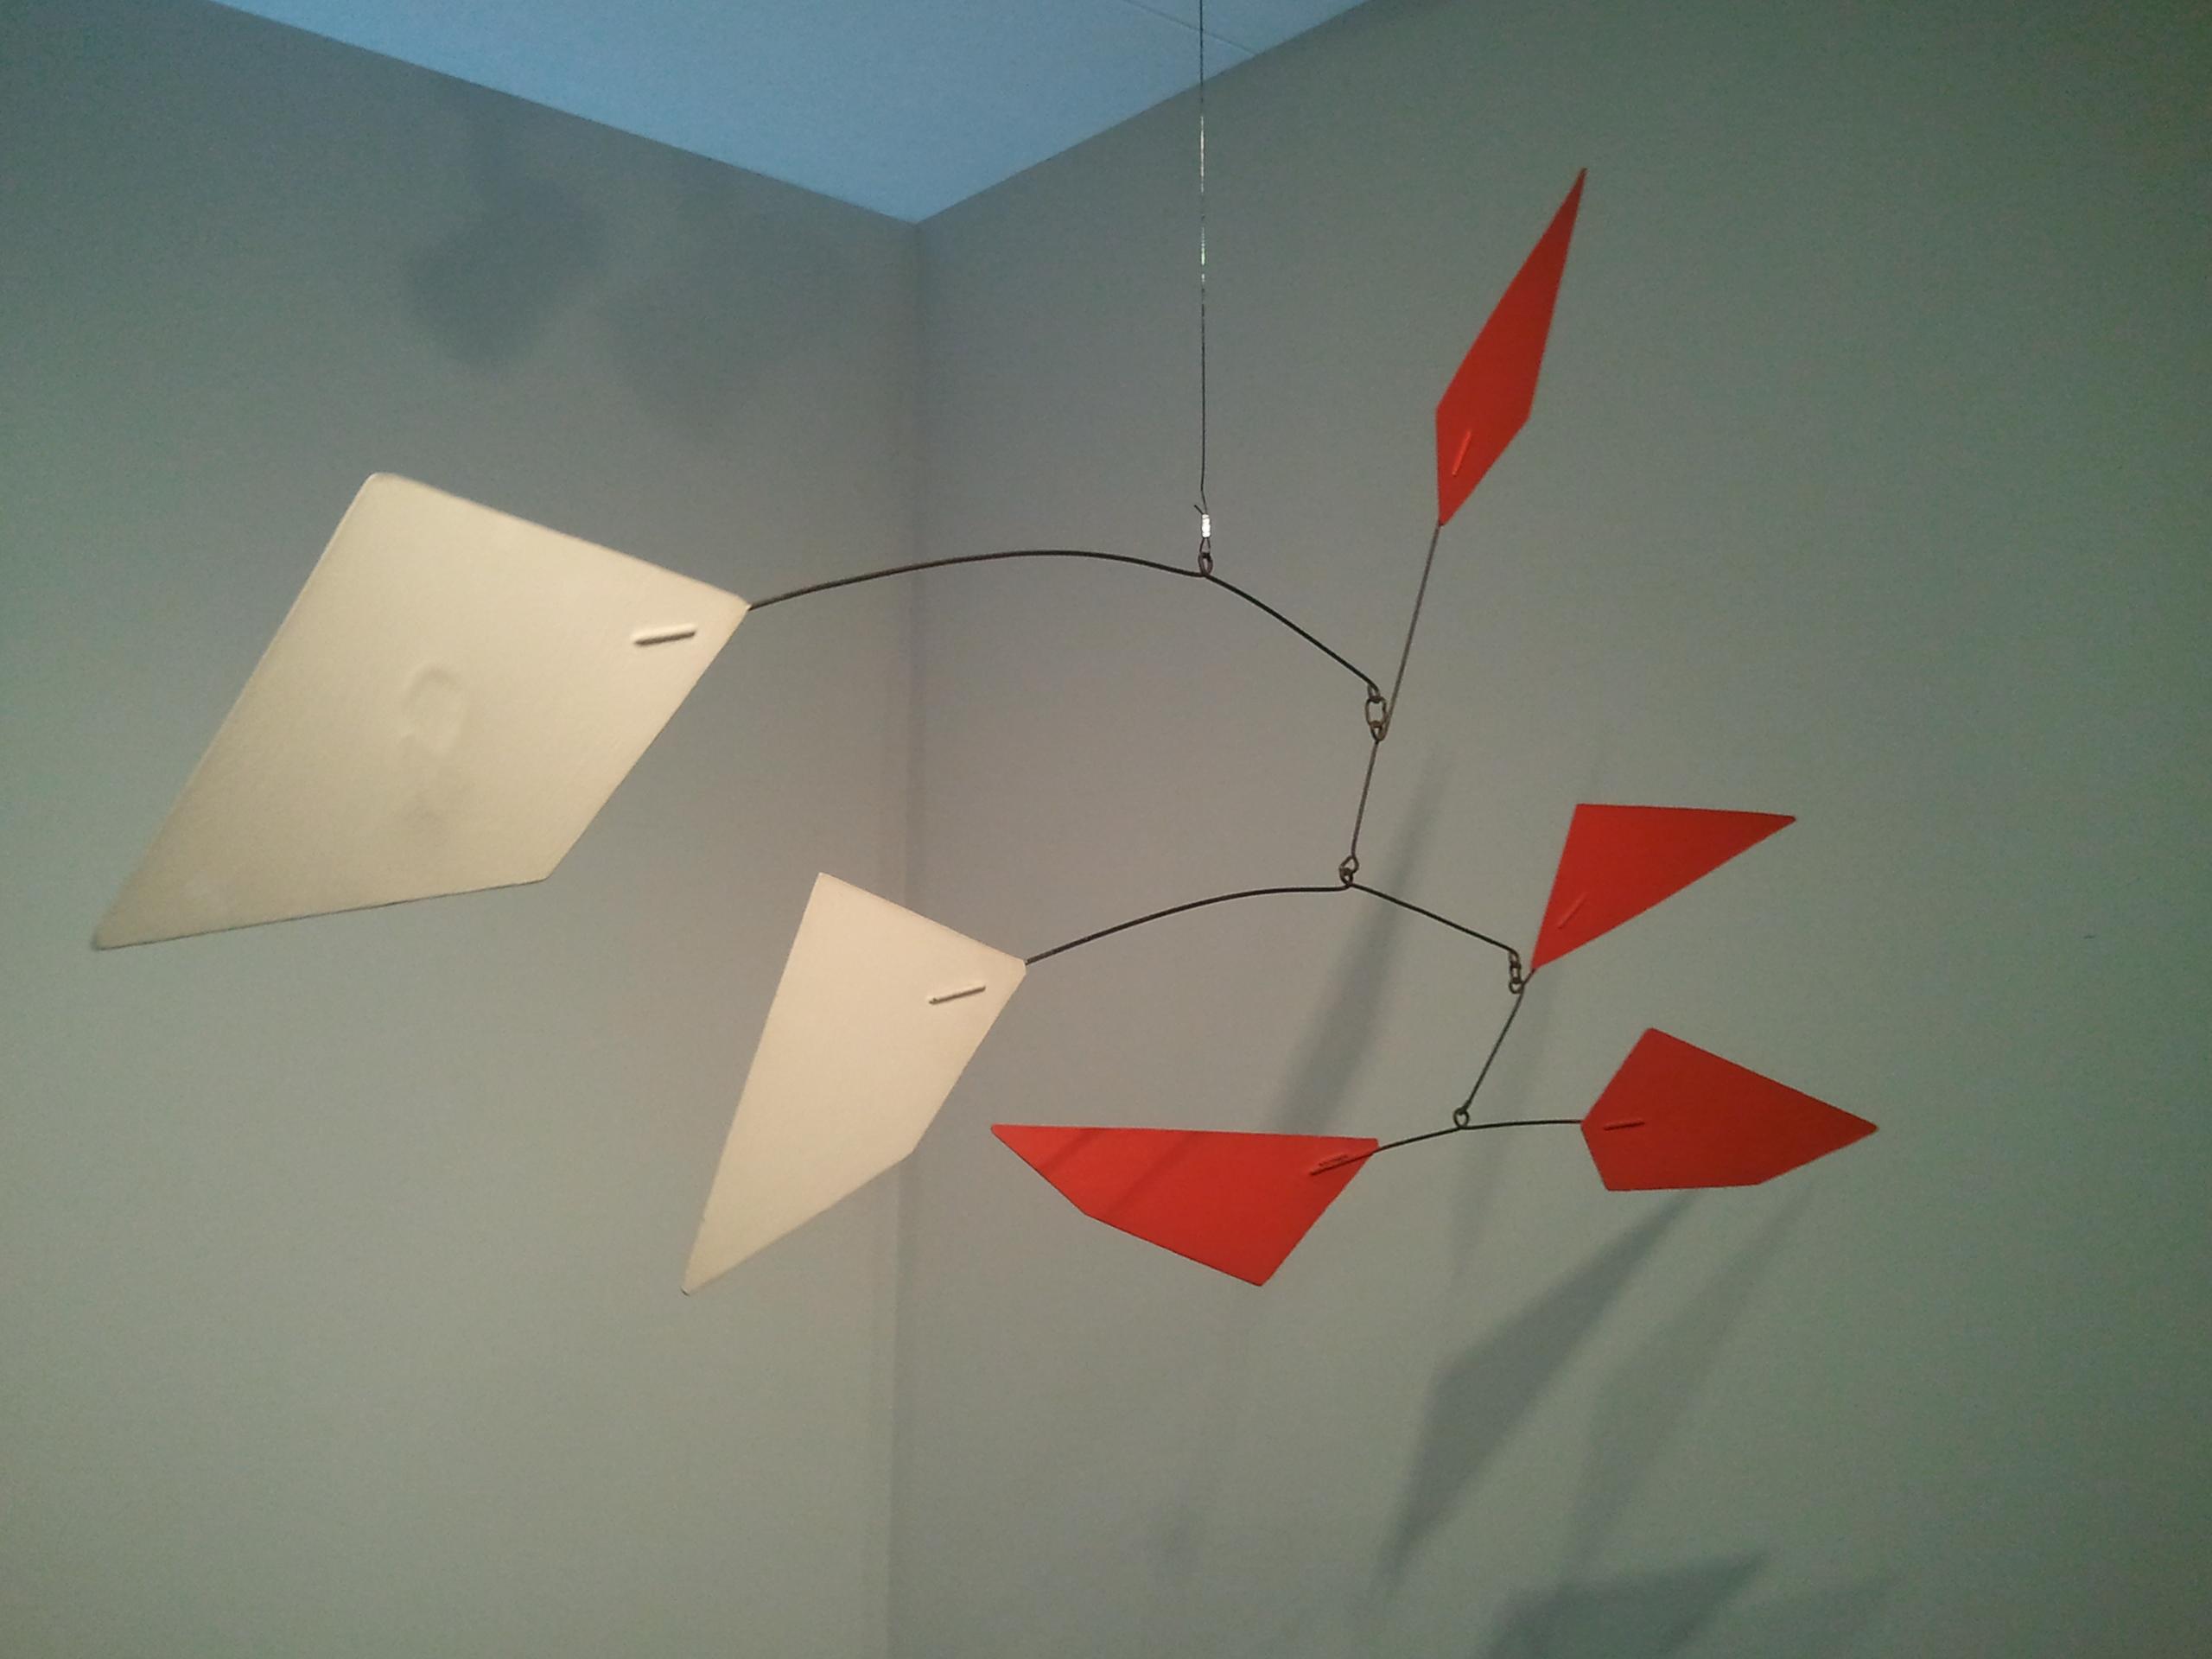 Alexander Calder | Brasil Art - 1421.8KB